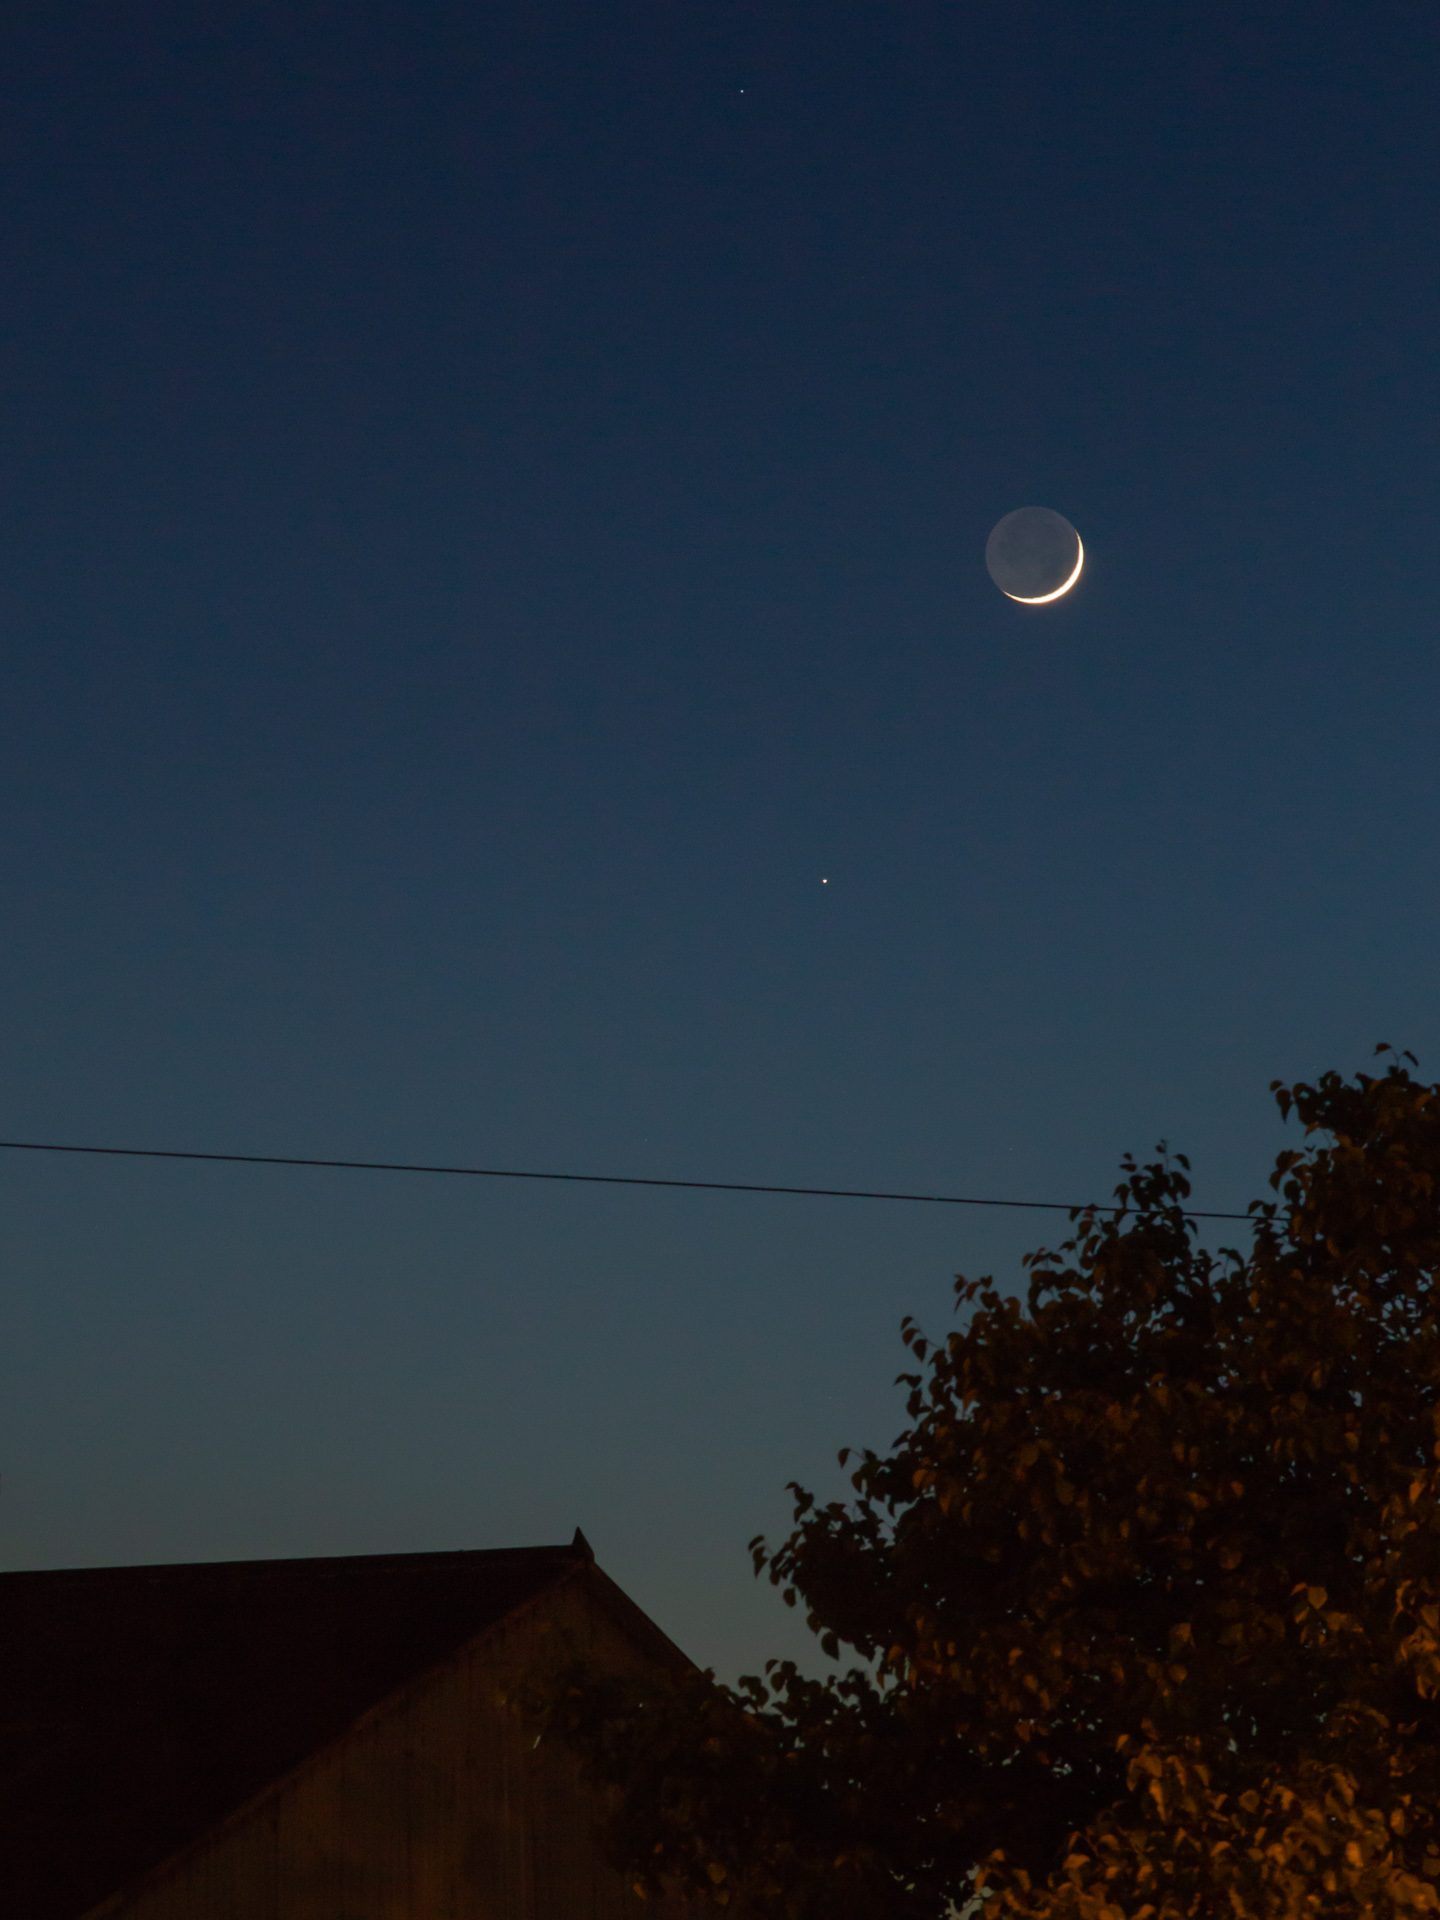 Waxing Crescent Moon* | 20190506 2057 W:38.96x77.00@77m